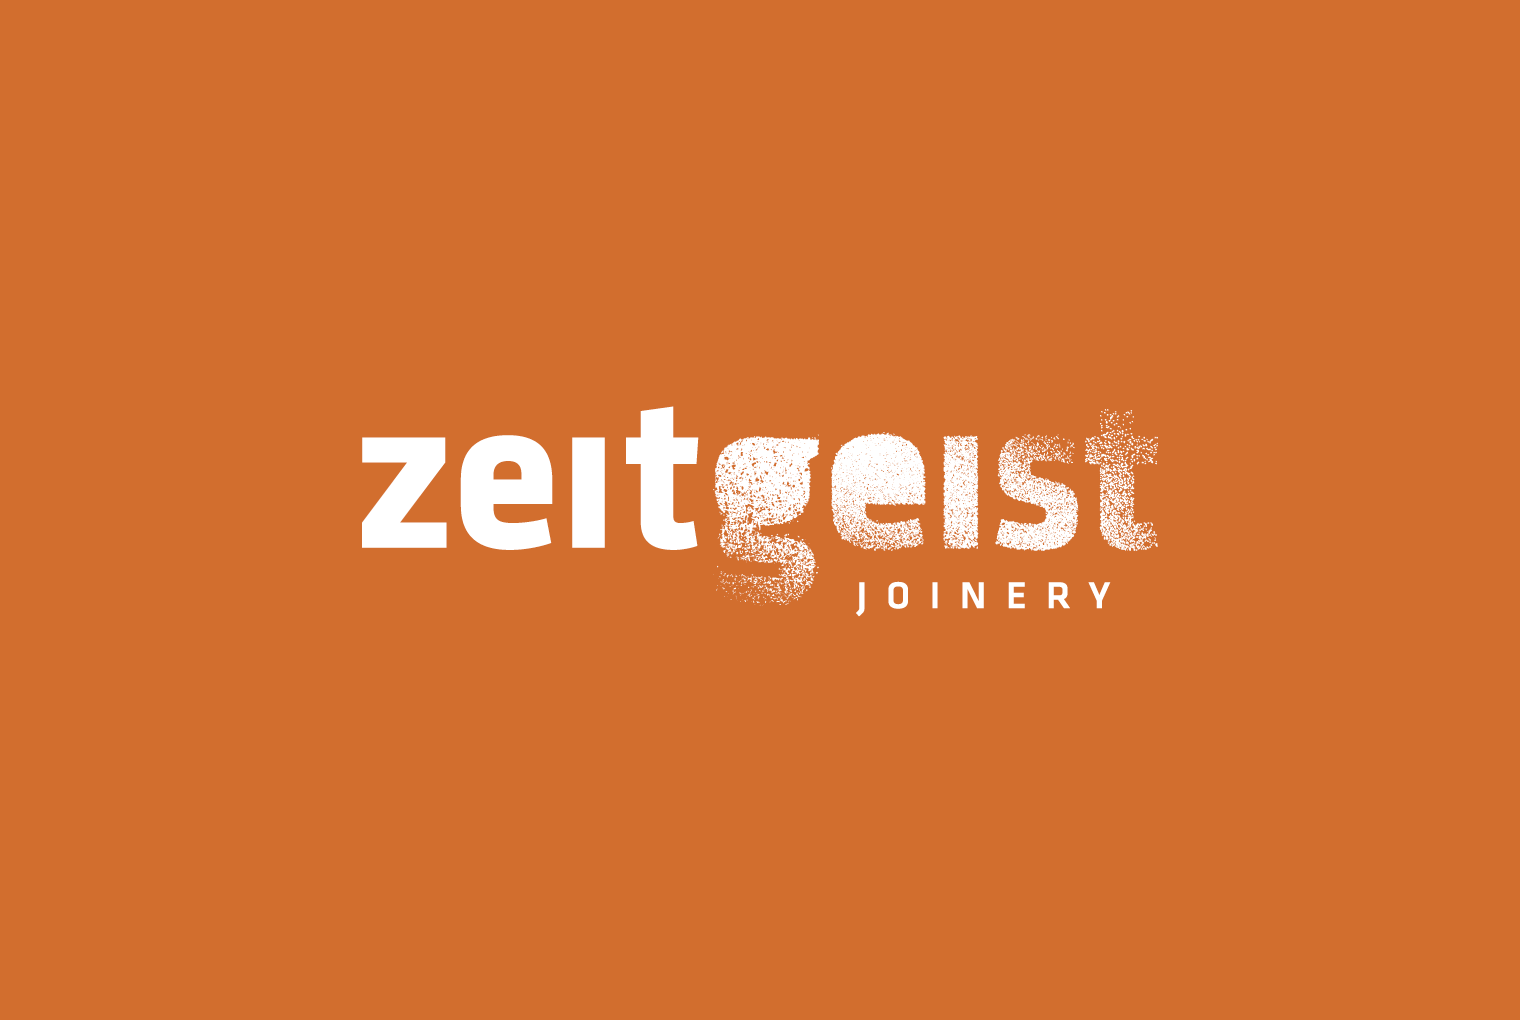 Logos_08_zeitgeist_joinery